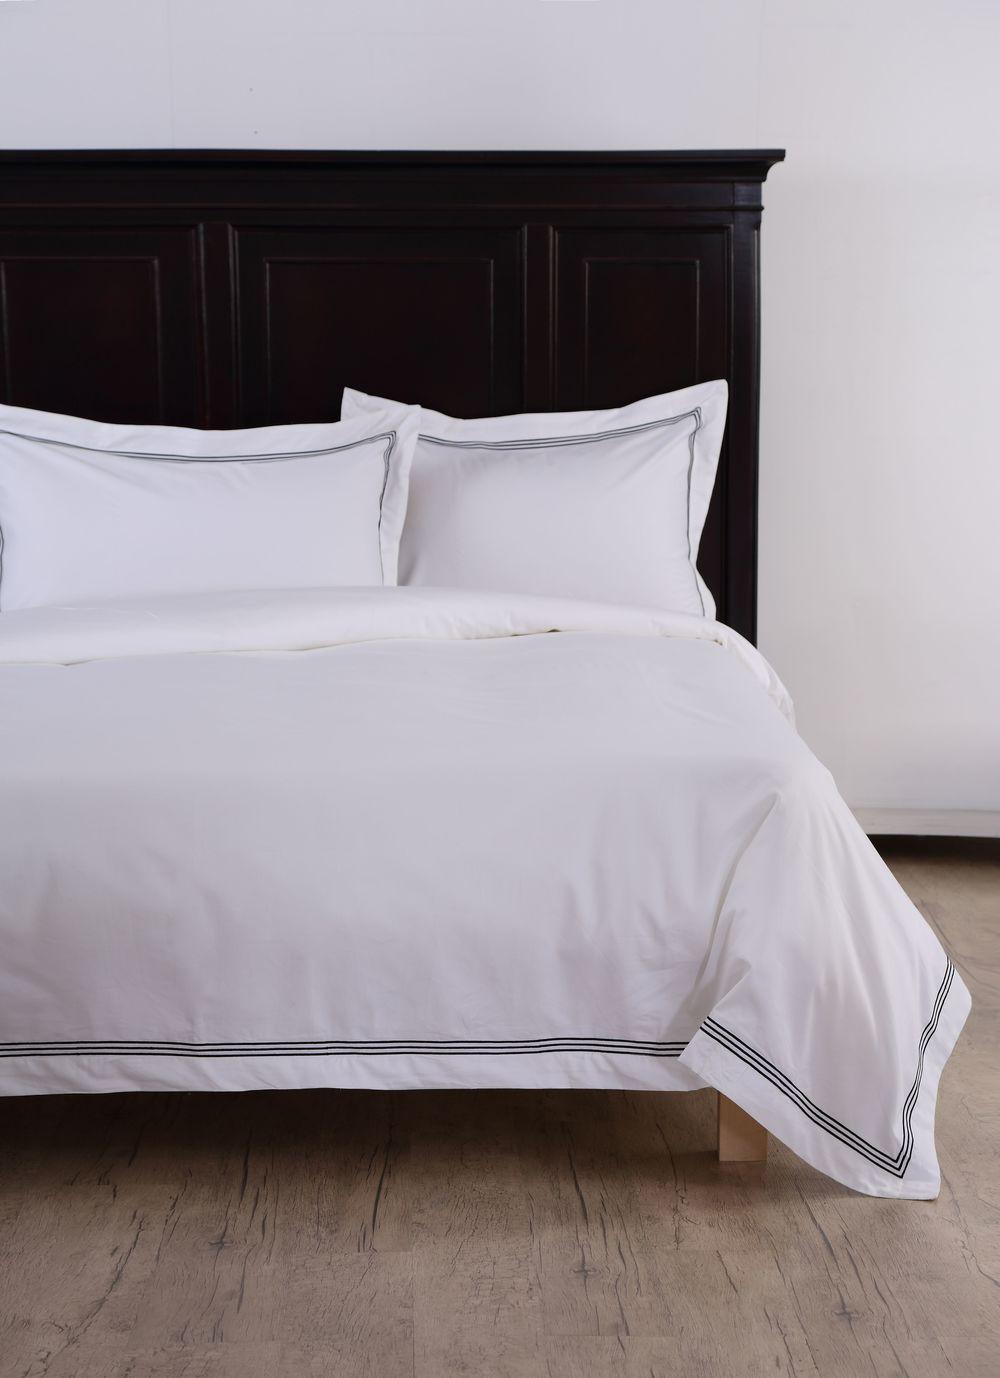 Sleep Naked Black Corded Luxury Bed Linen Set_HK$2145 For King Size